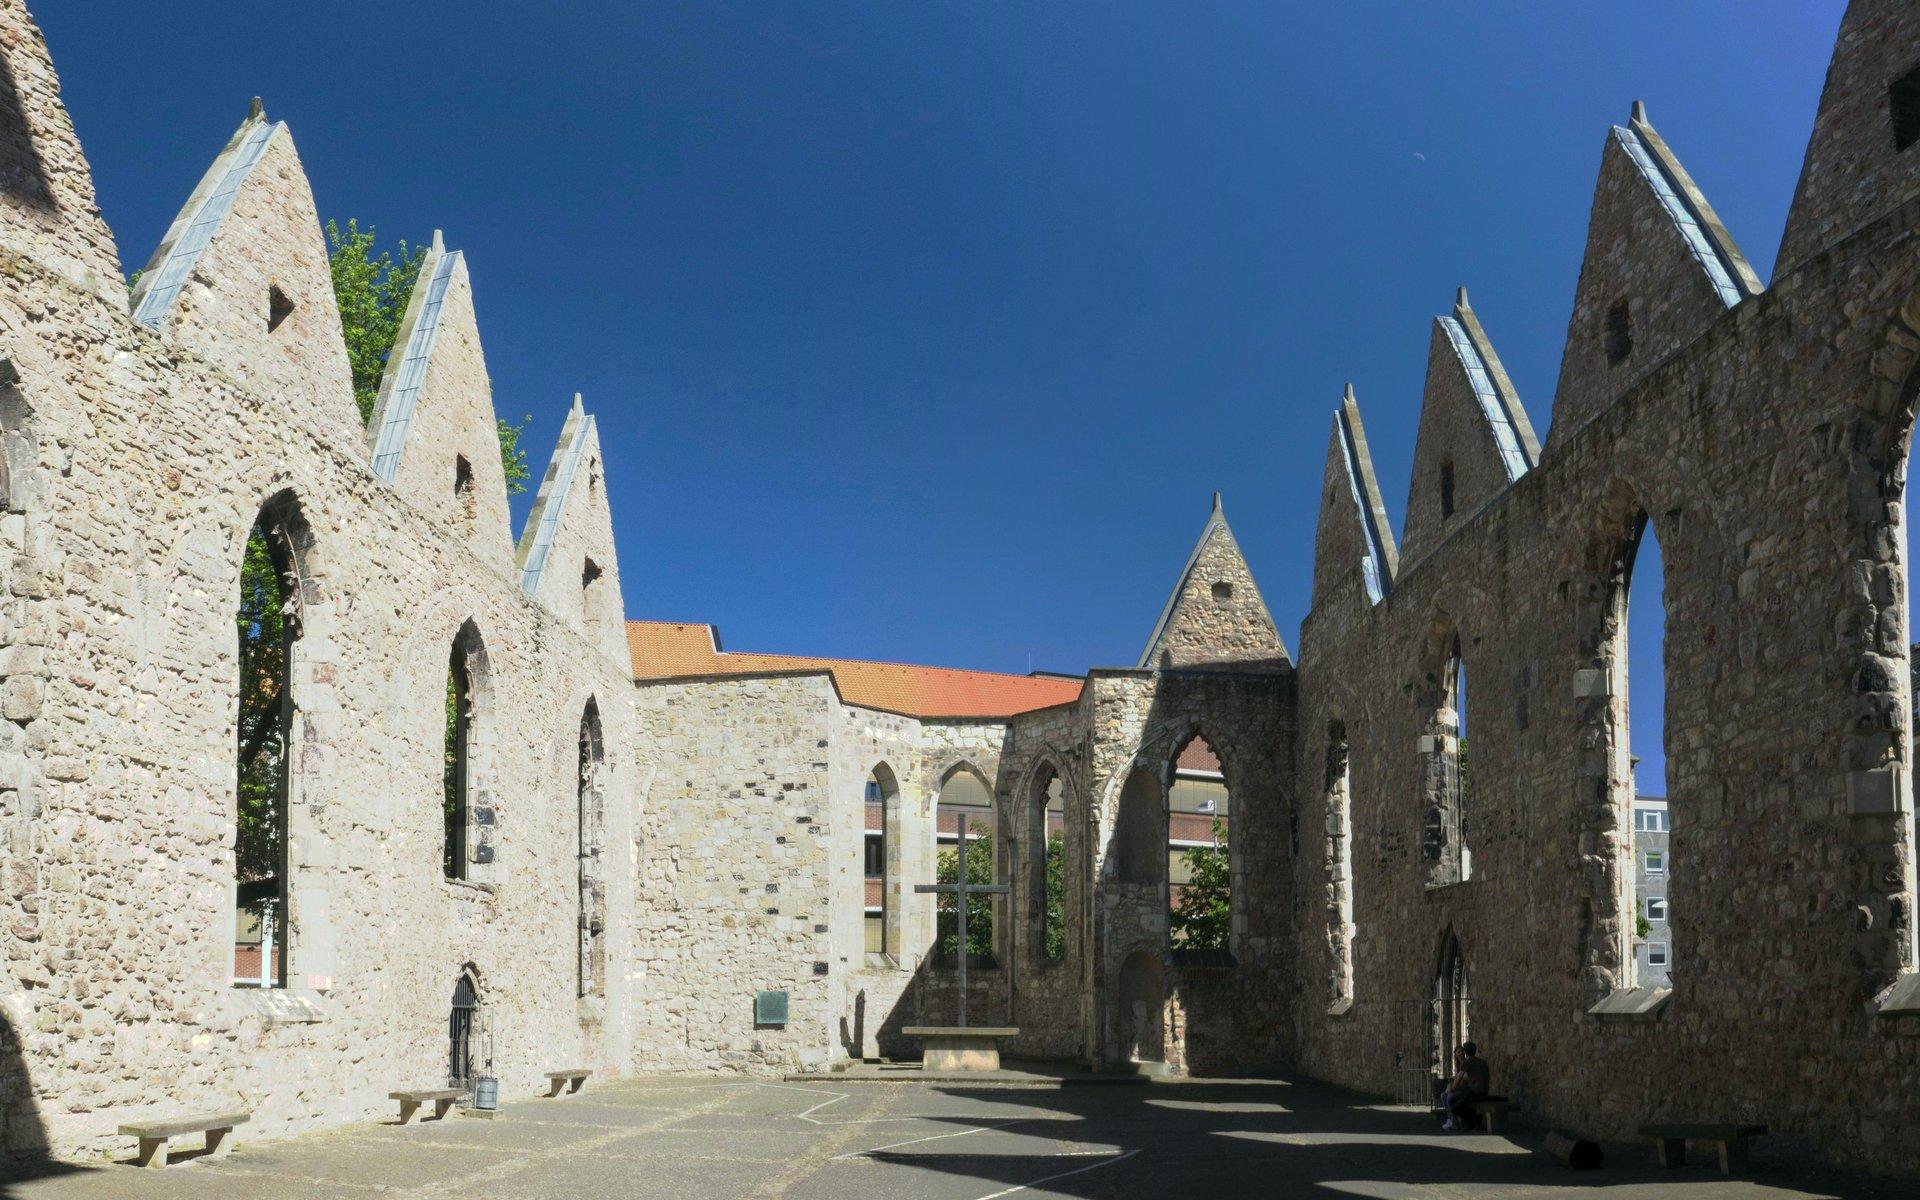 Aegidienkirche – Innenhof